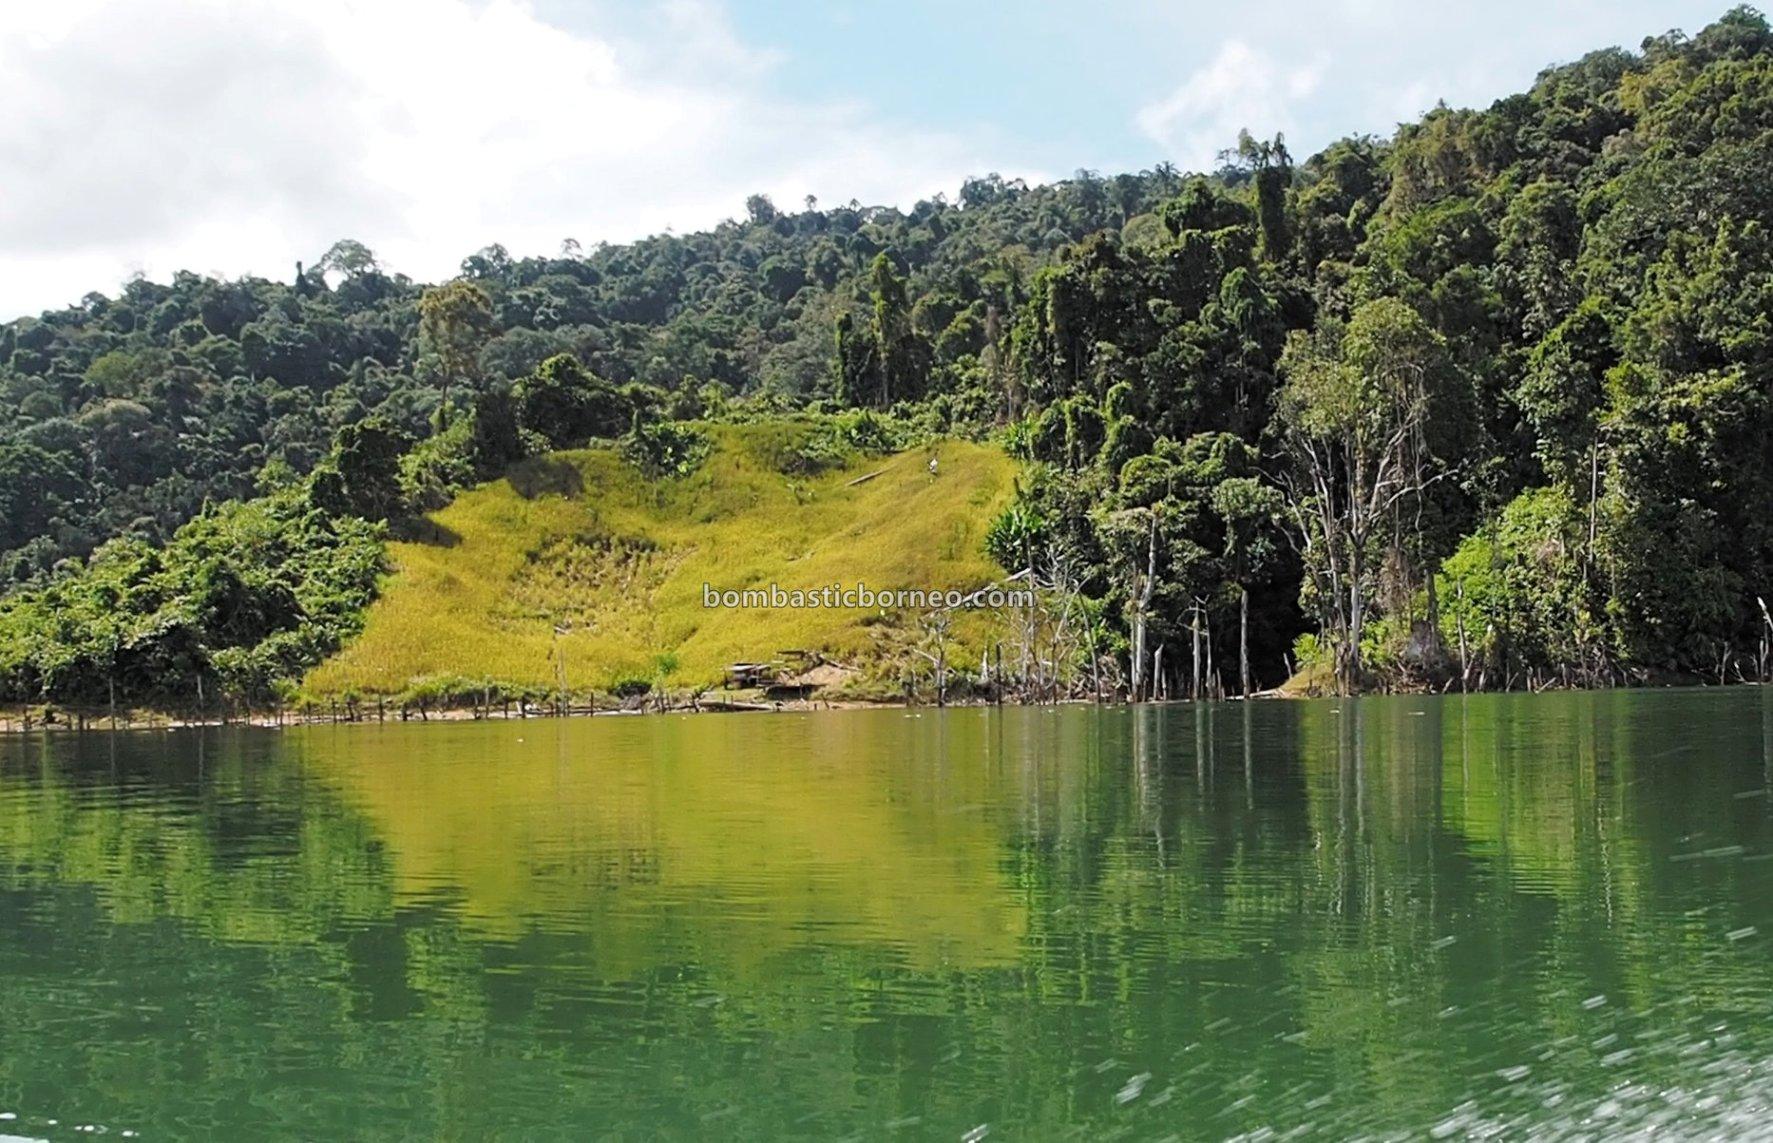 Embankment Dam, empangan, destination, Sungai Balui, native, fishing trip, chalet, Sarawak, Tourism, tourist attraction, travel guide, Borneo, 婆罗洲砂拉越, 巫拉甲峇贡水坝, 加帛马来西亚,